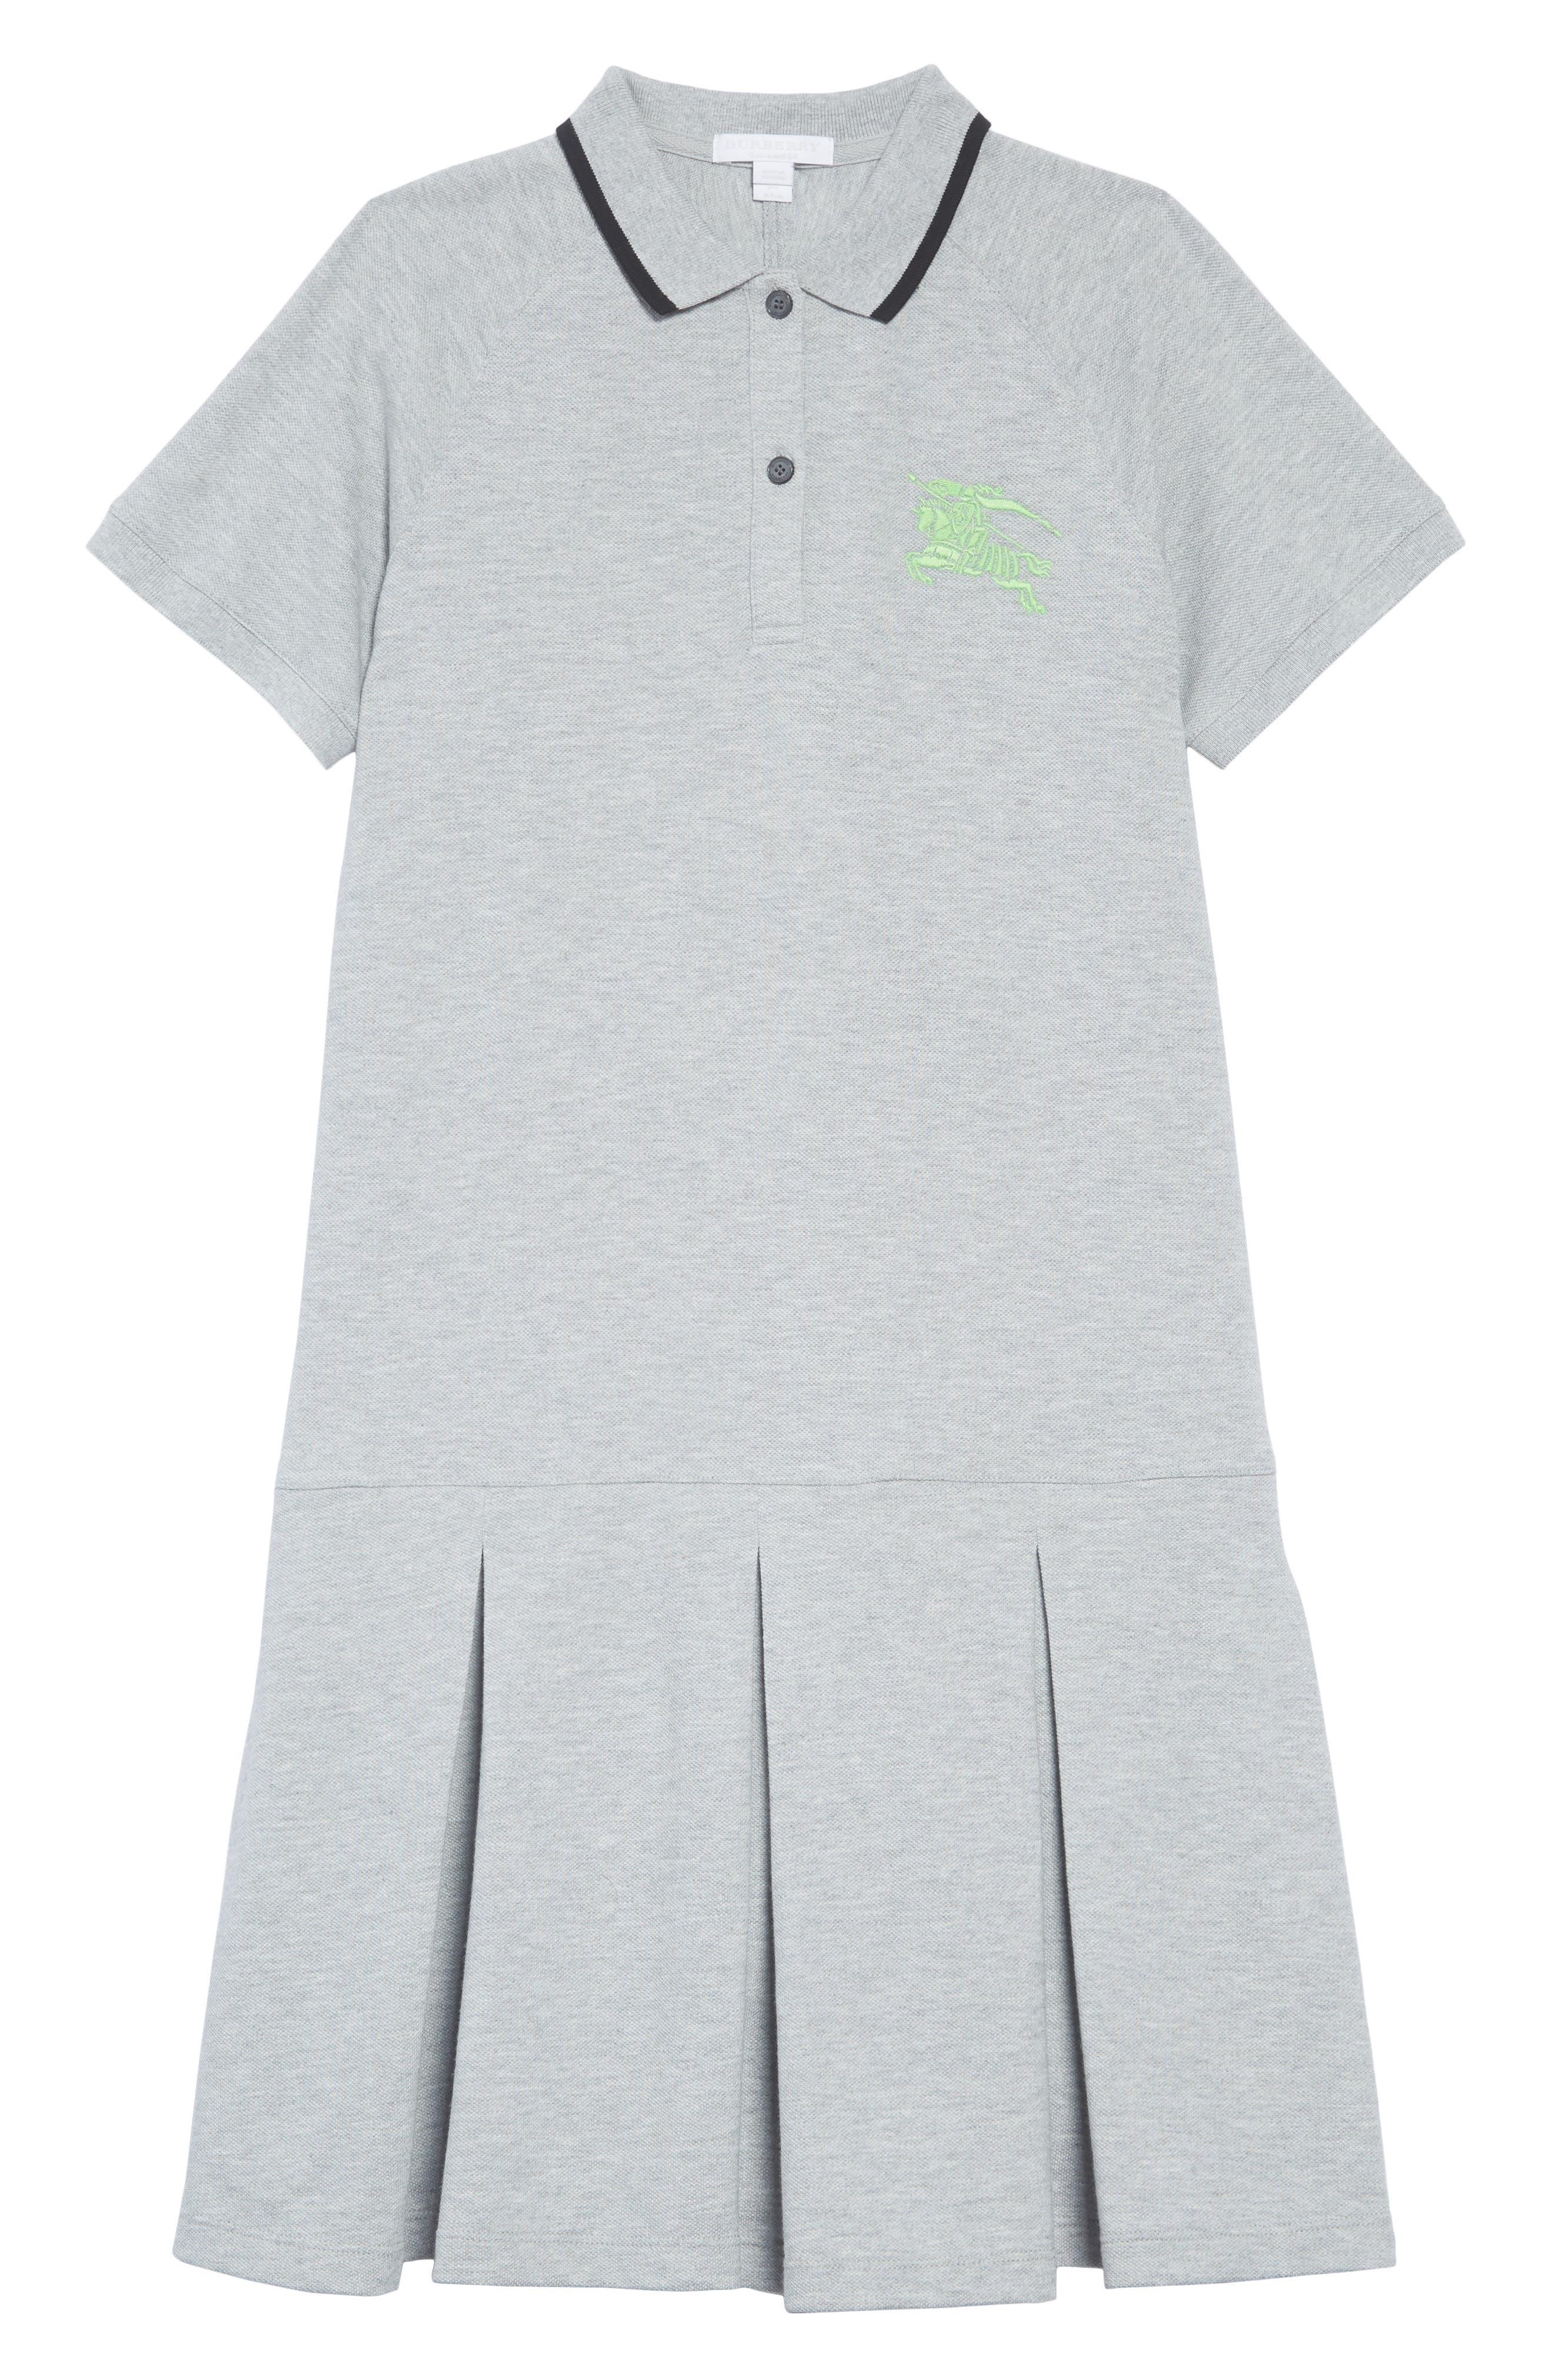 Mollyanna Polo Dress,                         Main,                         color, GREY MELANGE